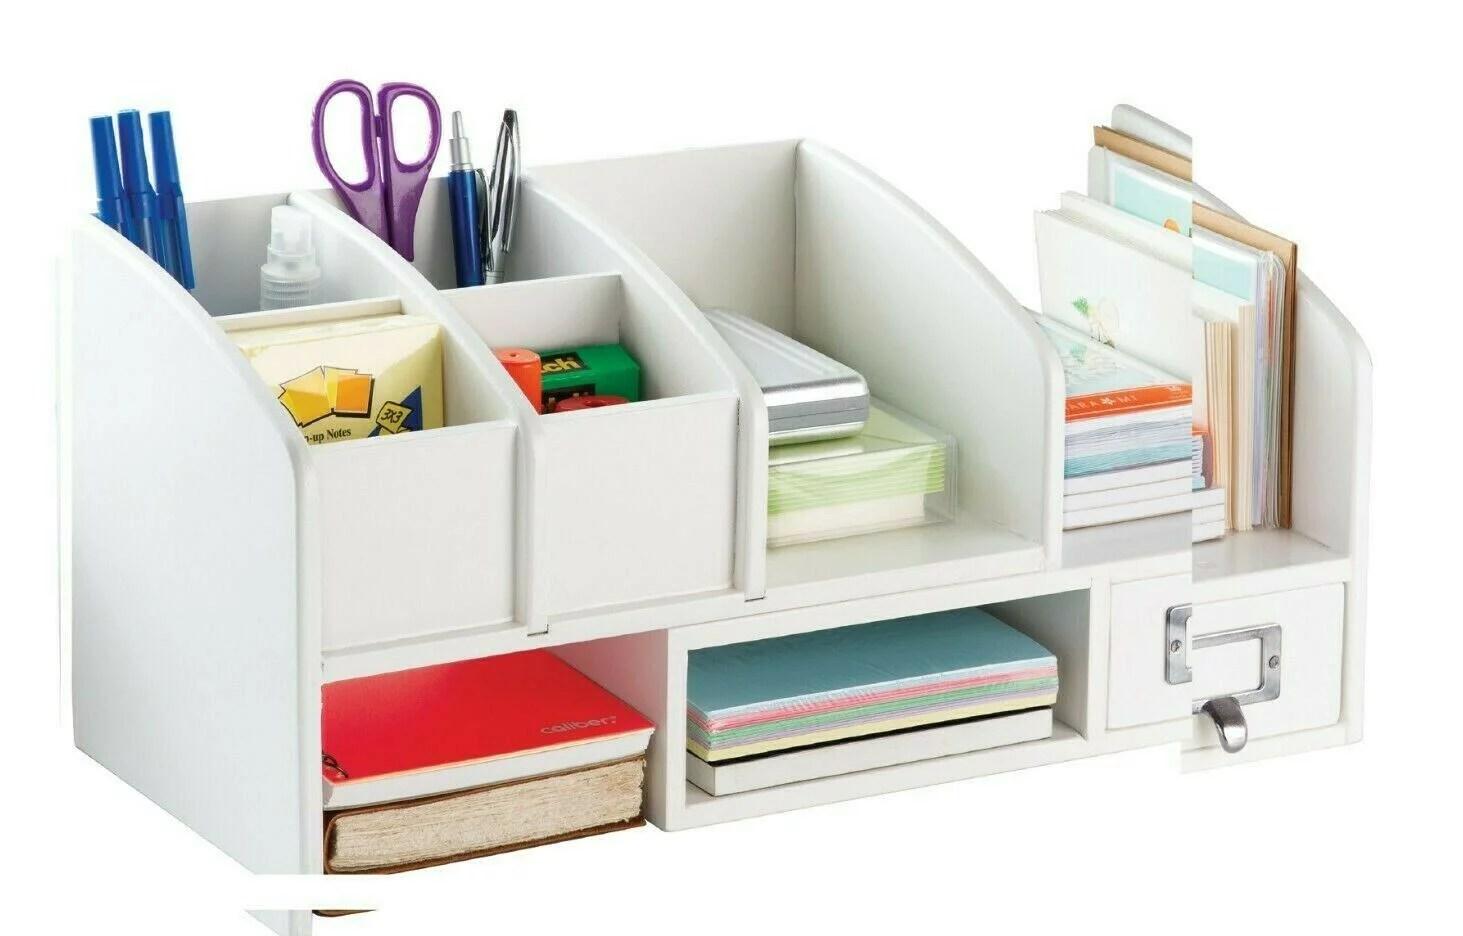 wood desk organizer shelf and drawers expandable for book file shelves desktop organization